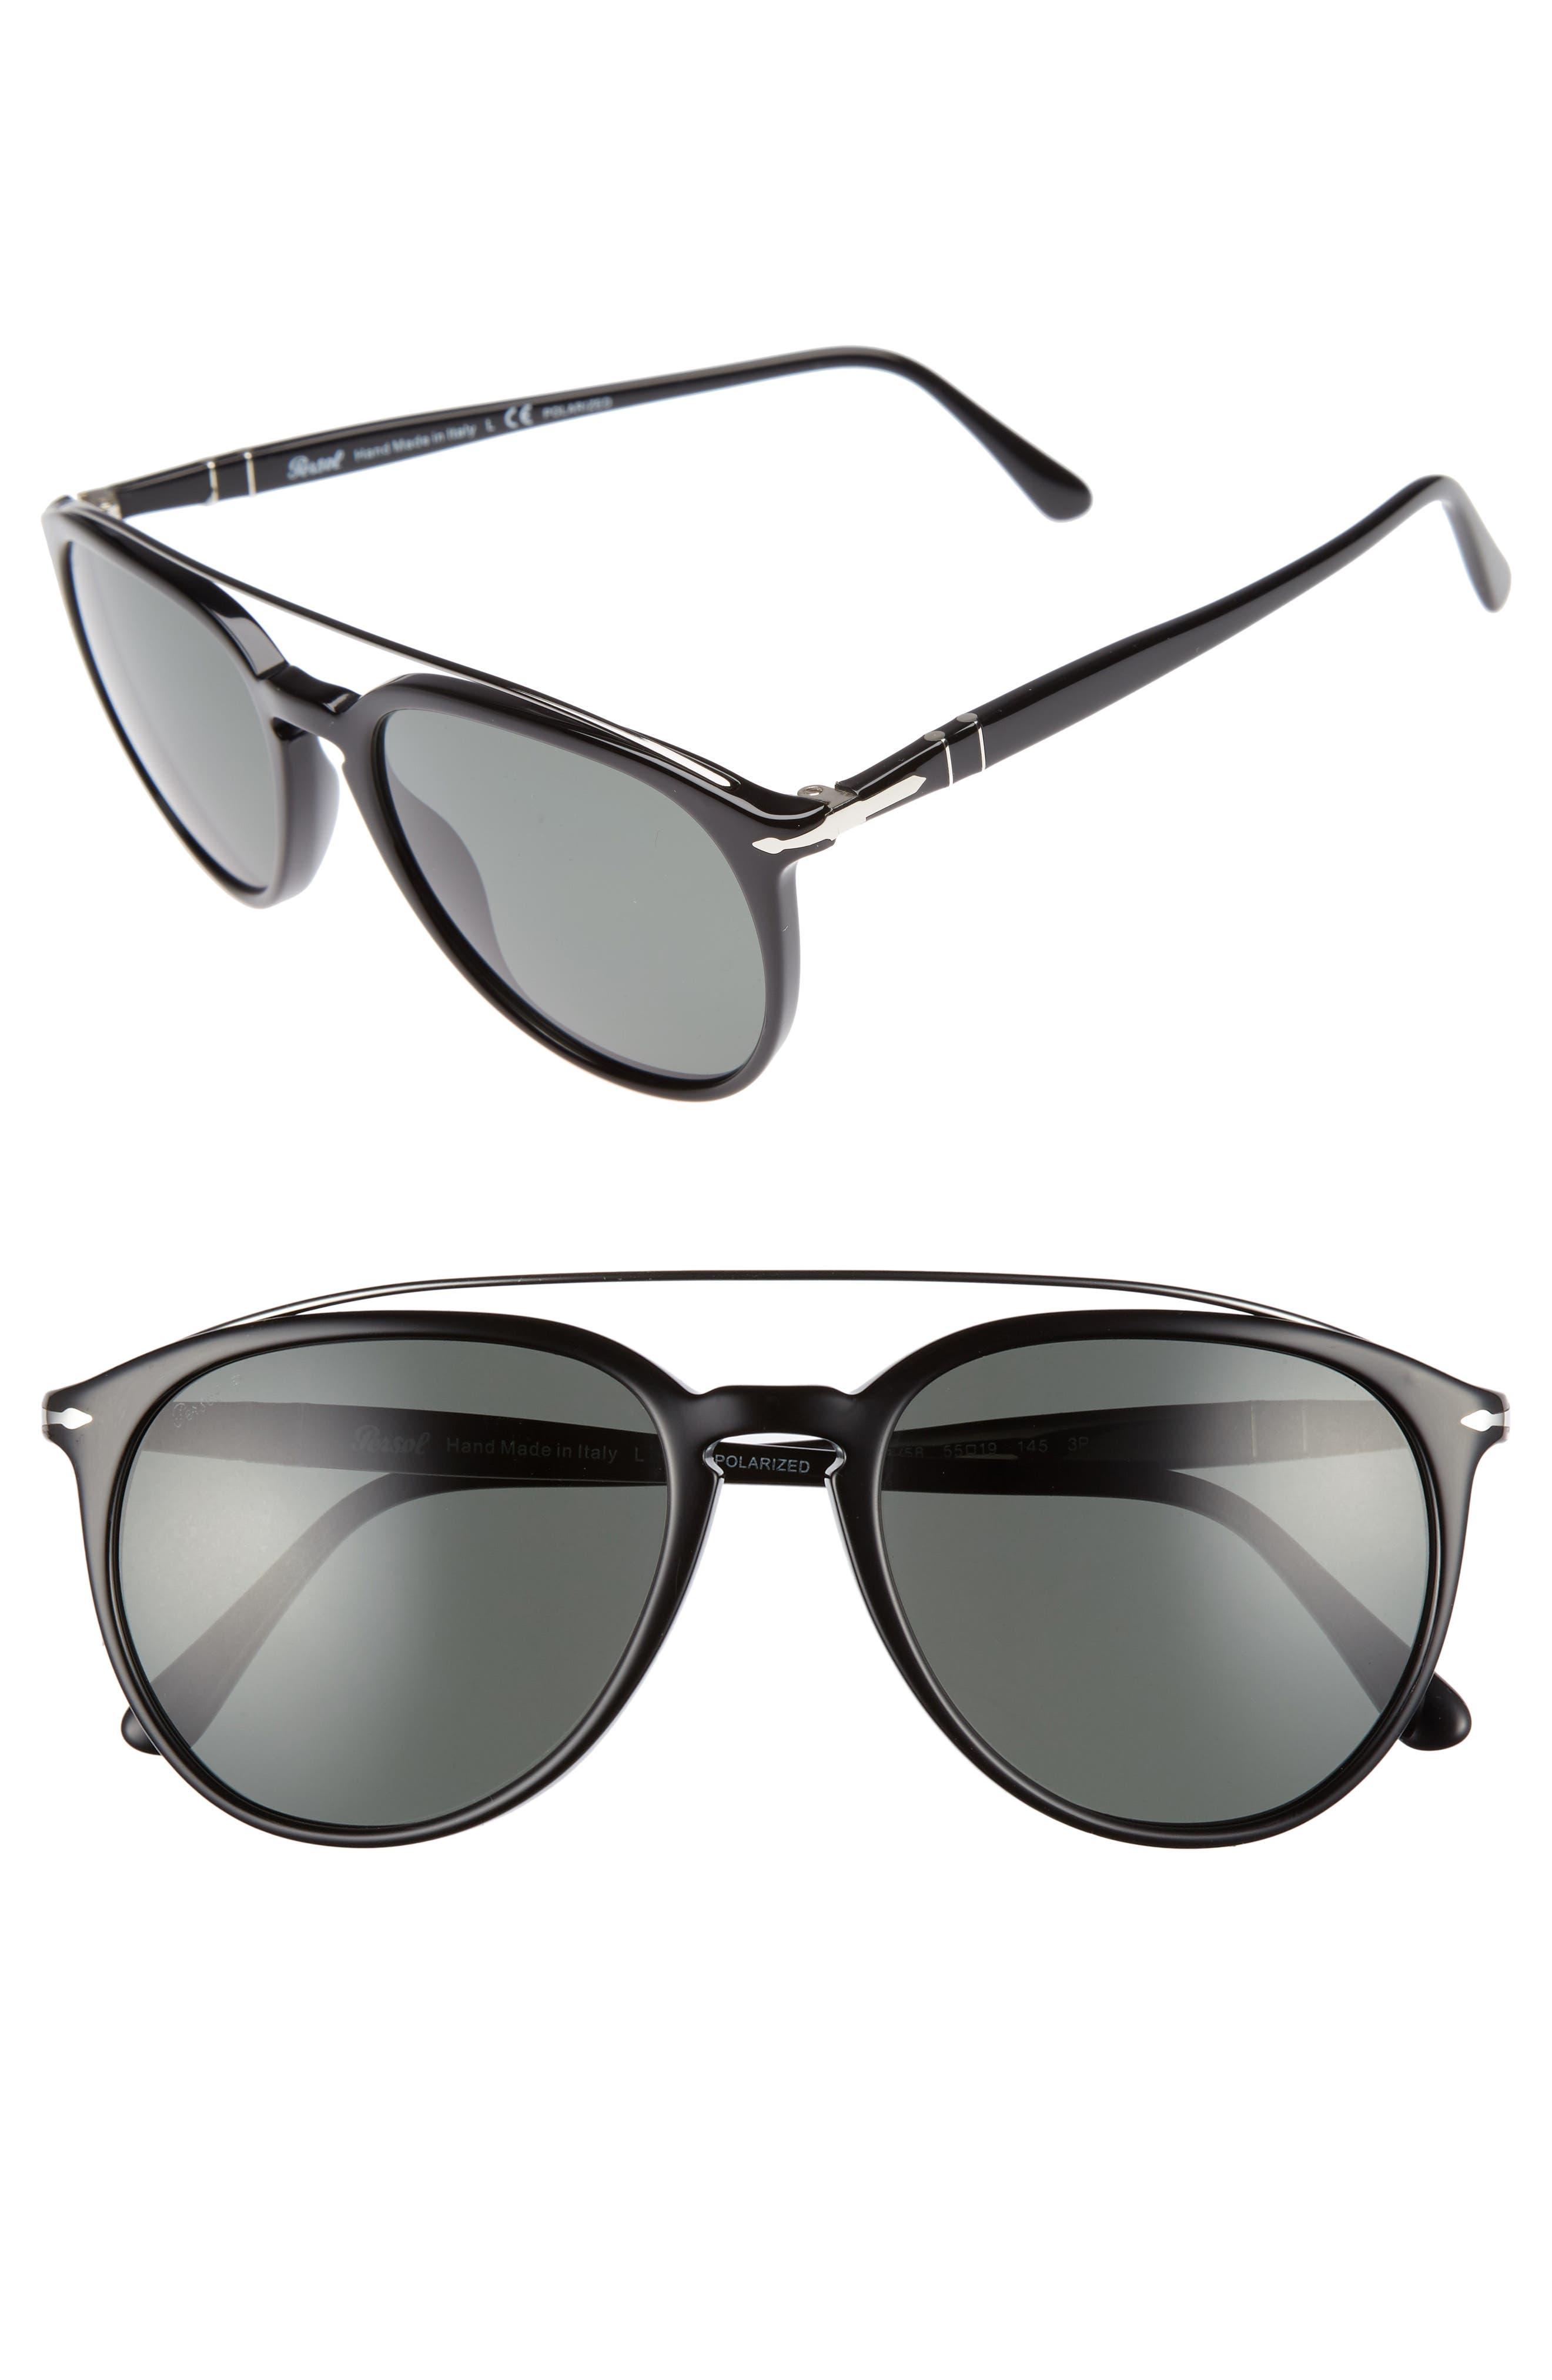 Alternate Image 1 Selected - Persol Sartoria 55mm Polarized Sunglasses